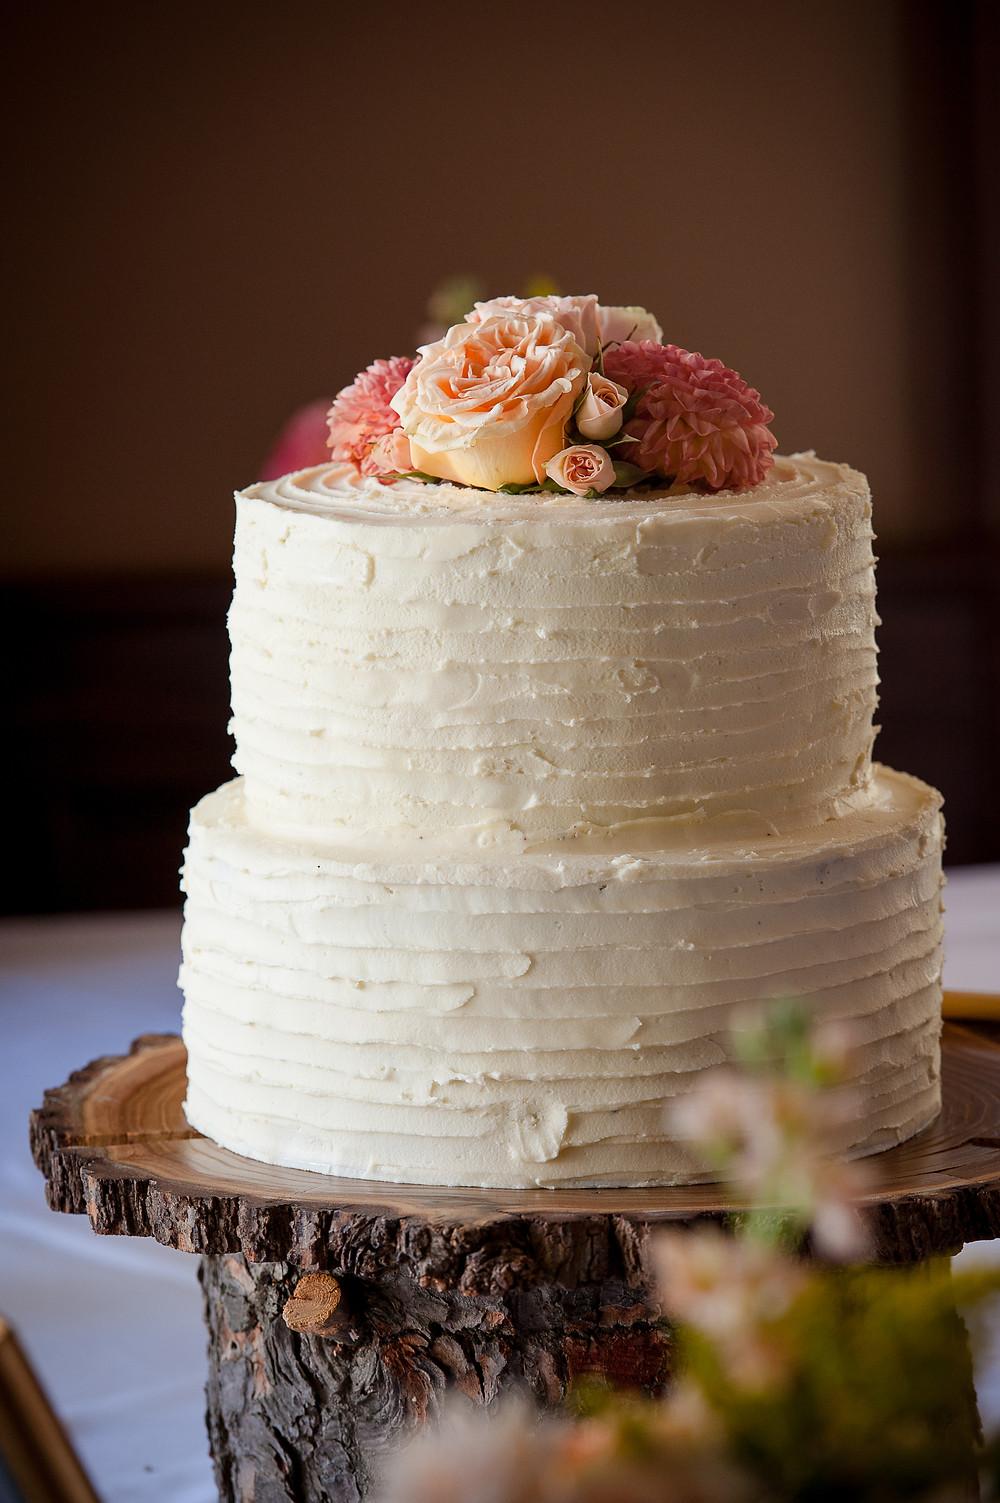 This beautiful cake was all chocolate fudge cake with white chocolate buttercream.